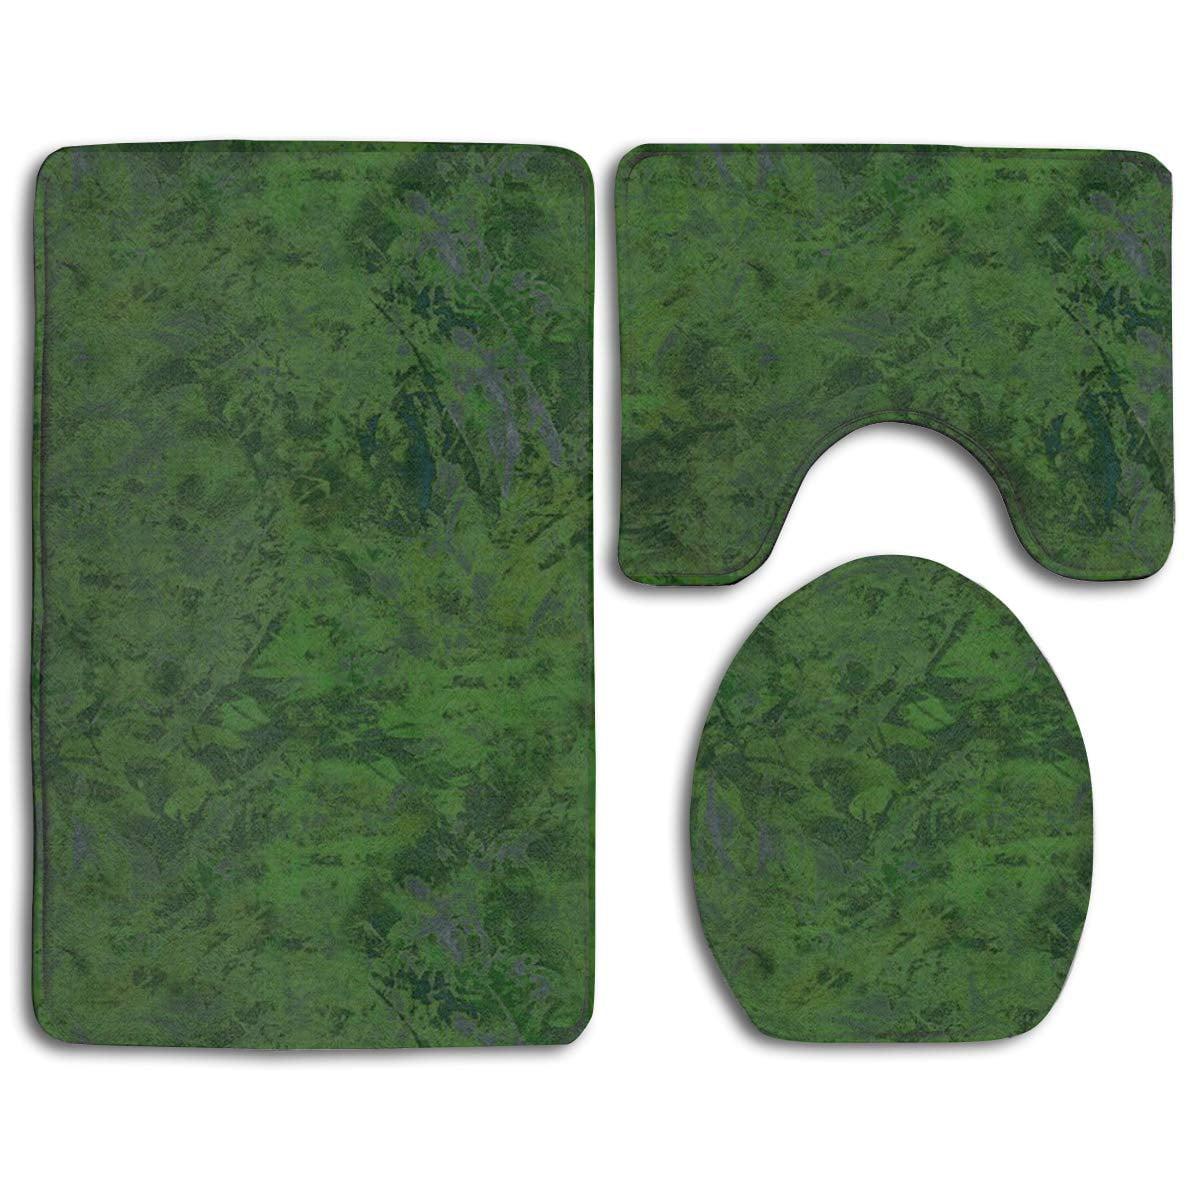 Gohao Dark Green Splash 3 Piece, Bathroom Contour Rug